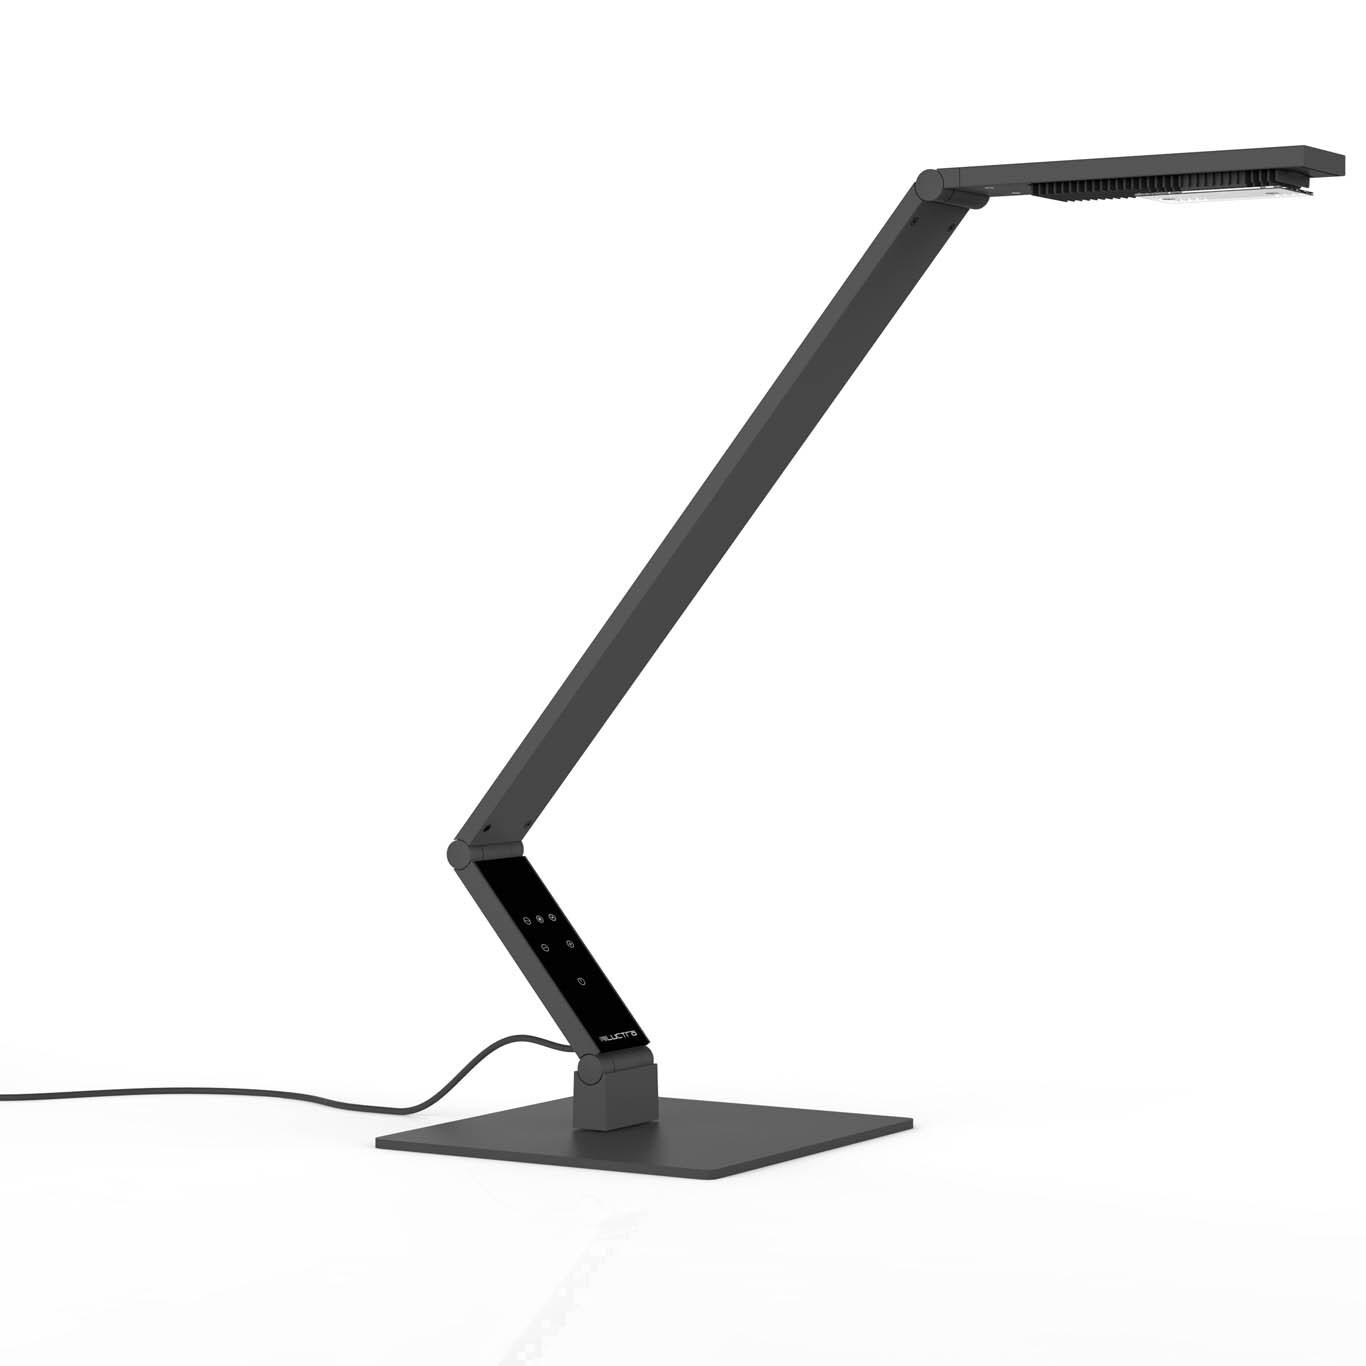 Linear bordslampa svart